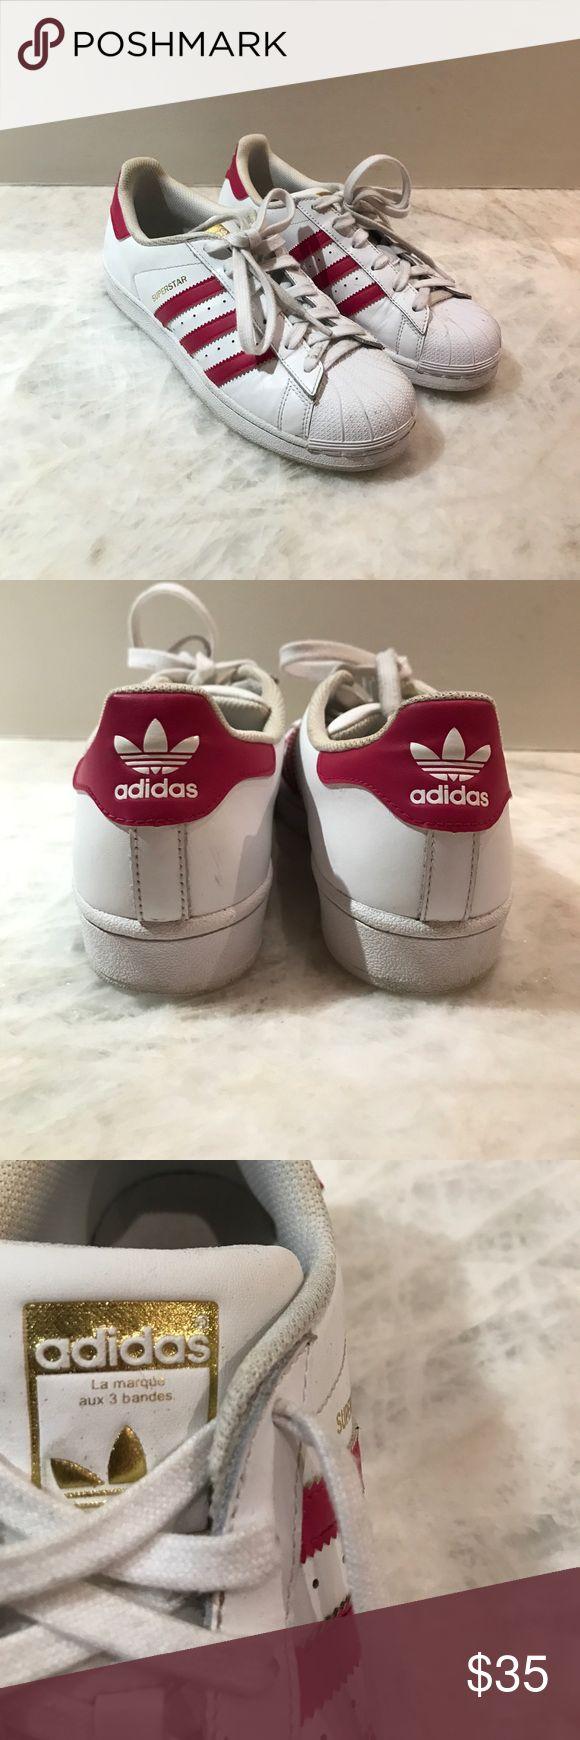 Adidas NMD Runner Vintage blanco y exuberante sneakerwholesale Rojo Lyrics